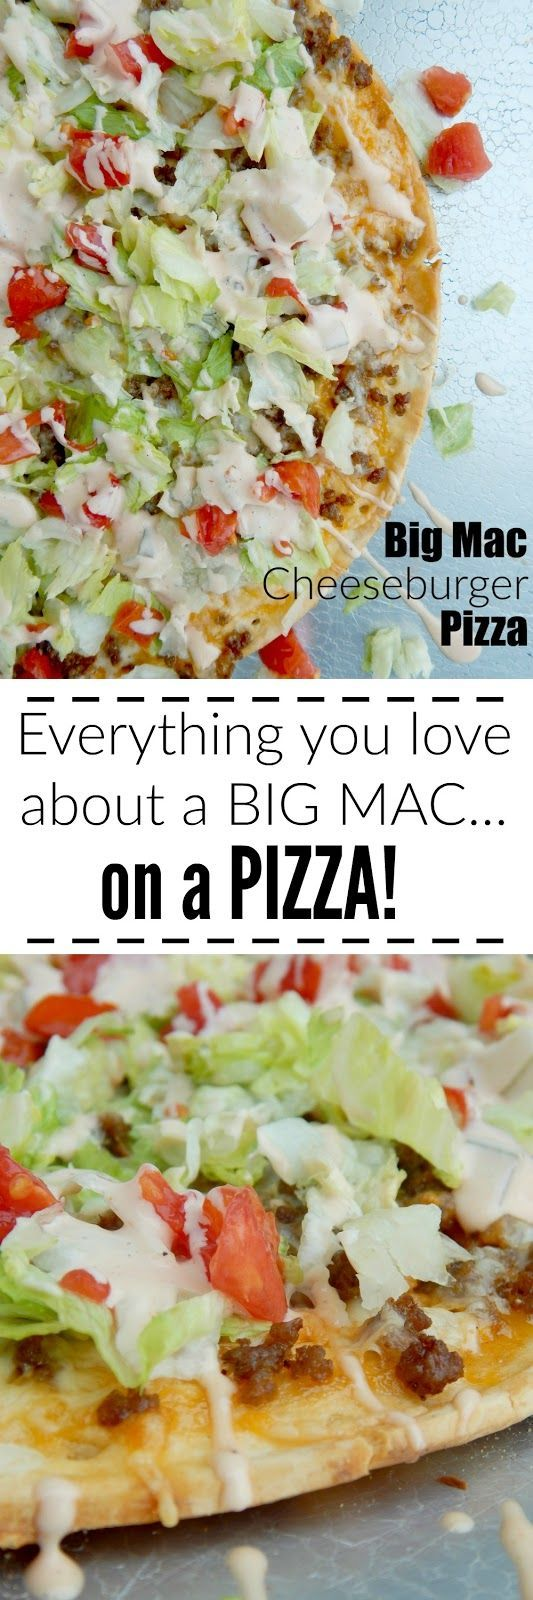 Big Mac Cheeseburger Pizza...the combination of ev…